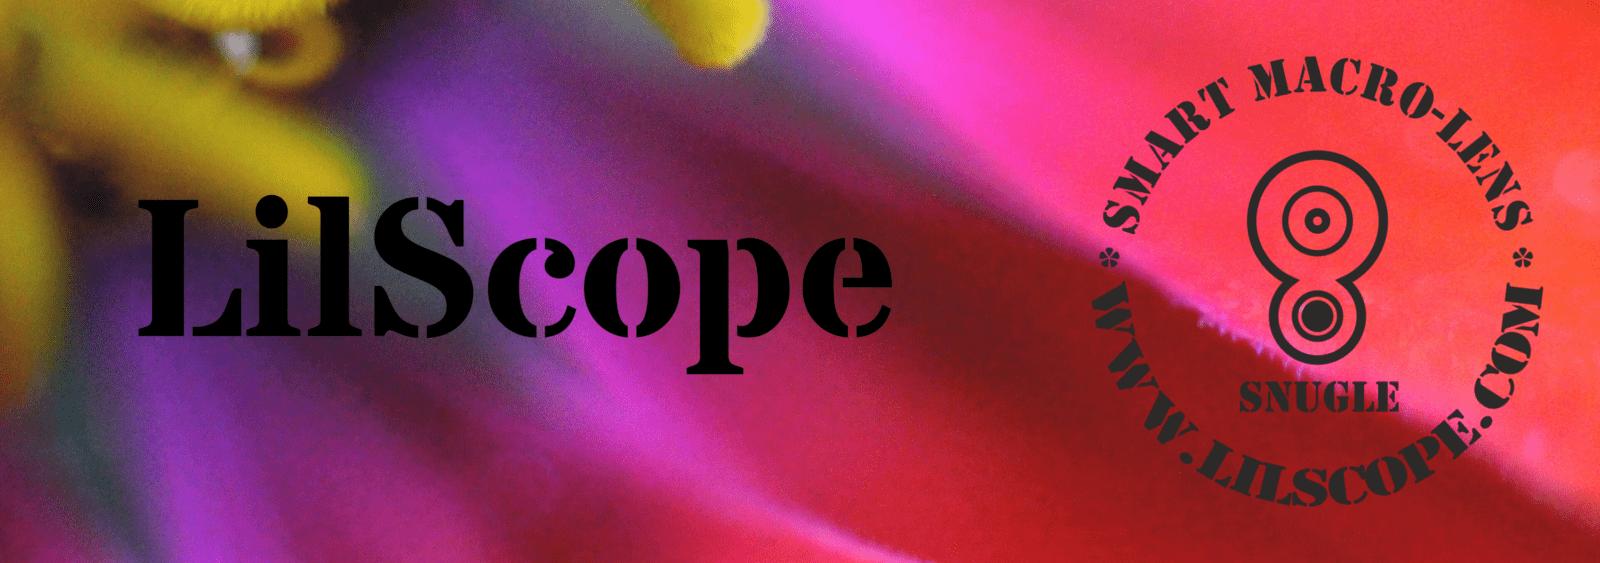 LilScope Banner